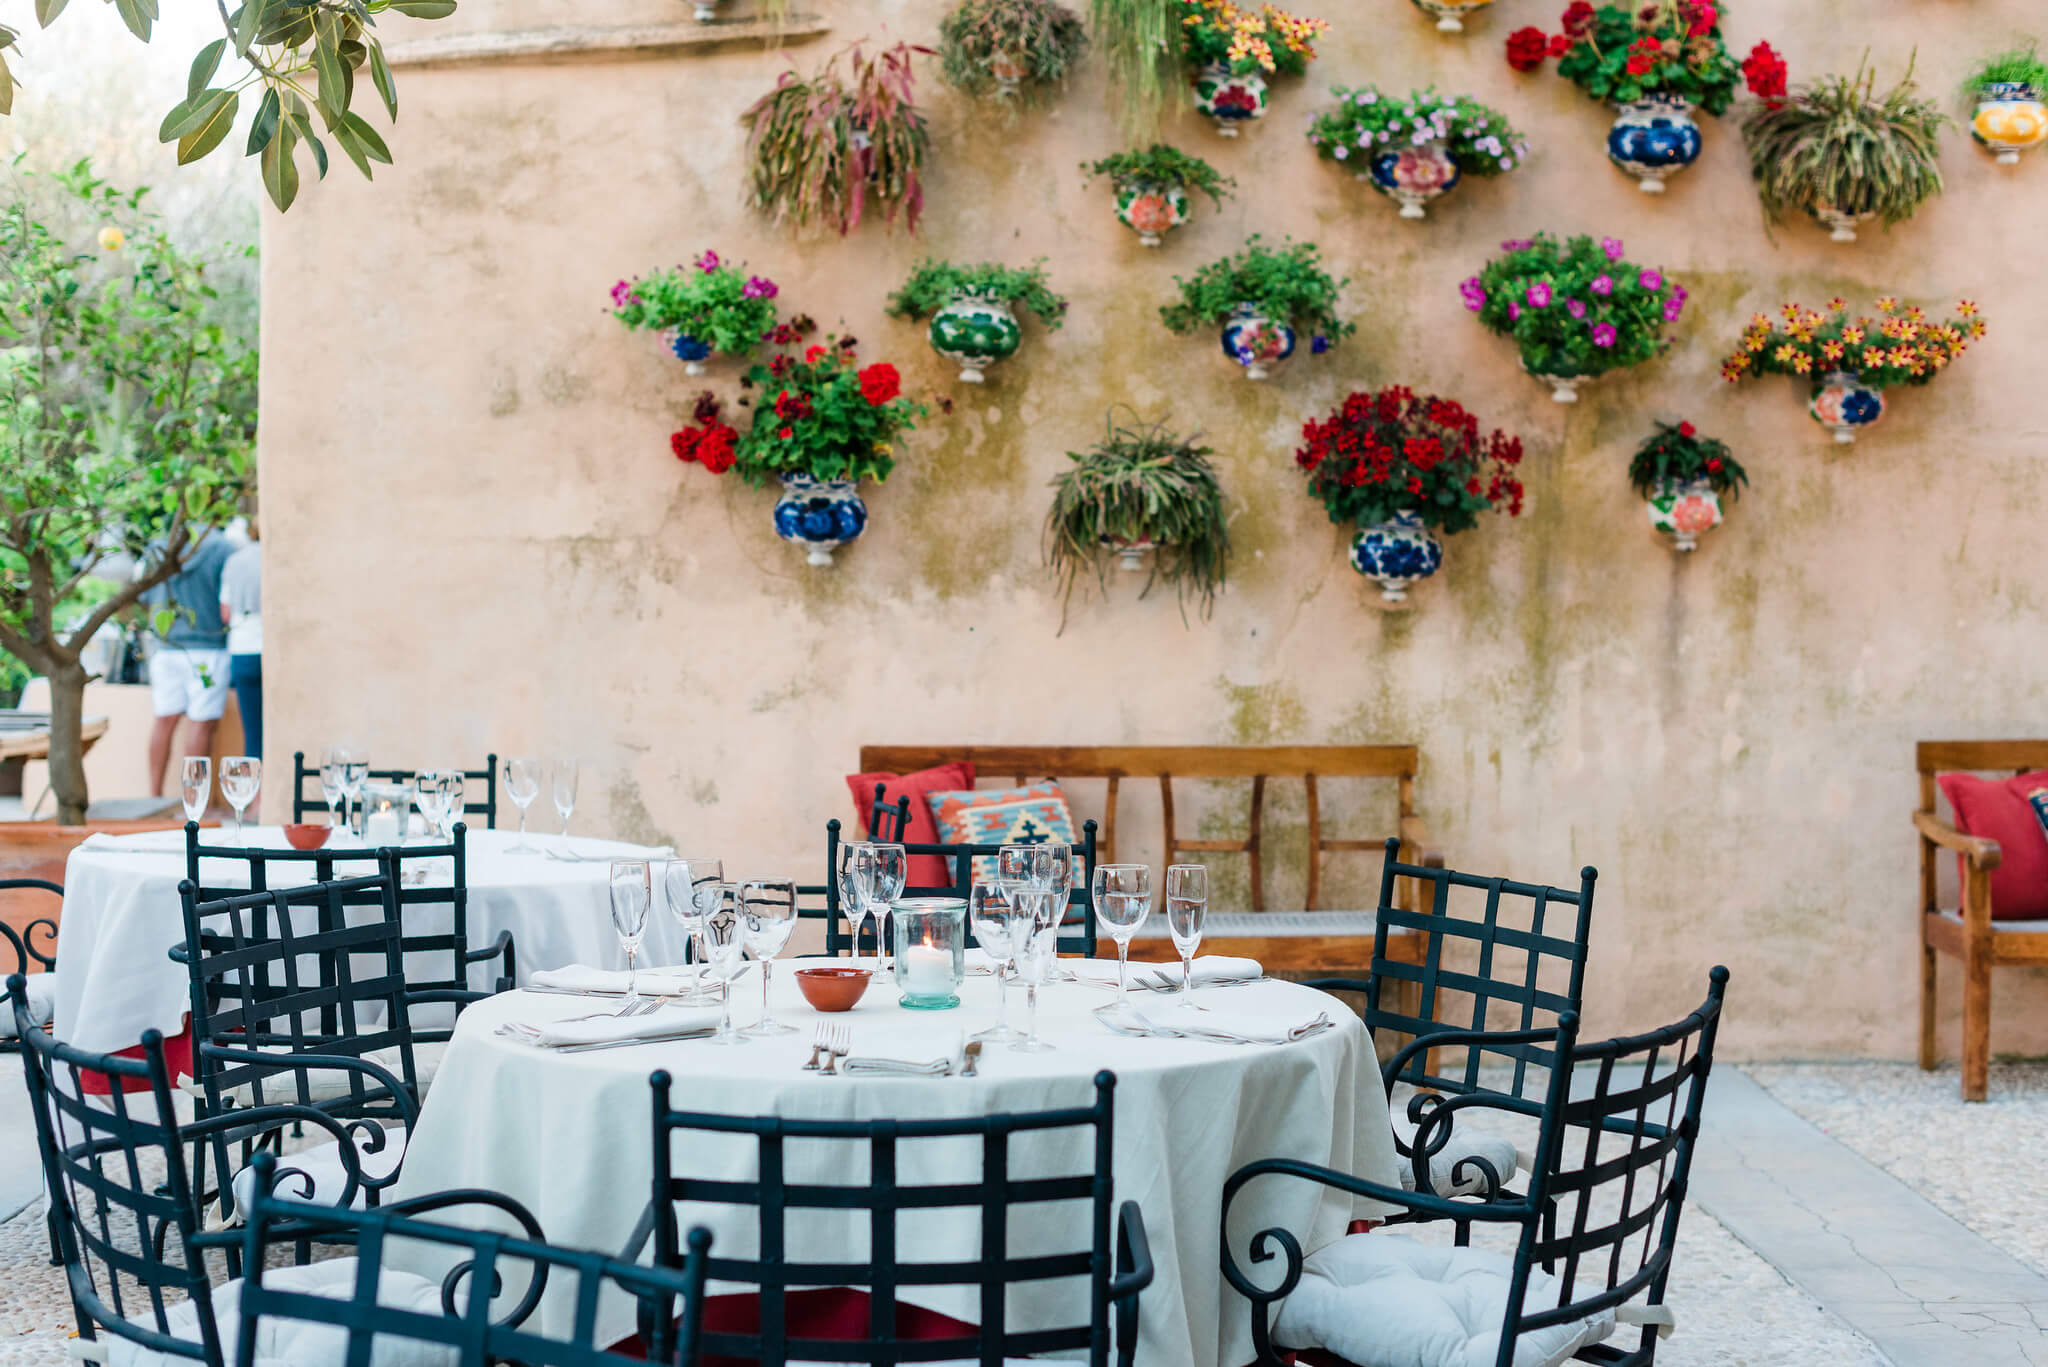 https://www.white-ibiza.com/wp-content/uploads/2020/03/formentera-restaurants-can-carlos-2020-05.jpg